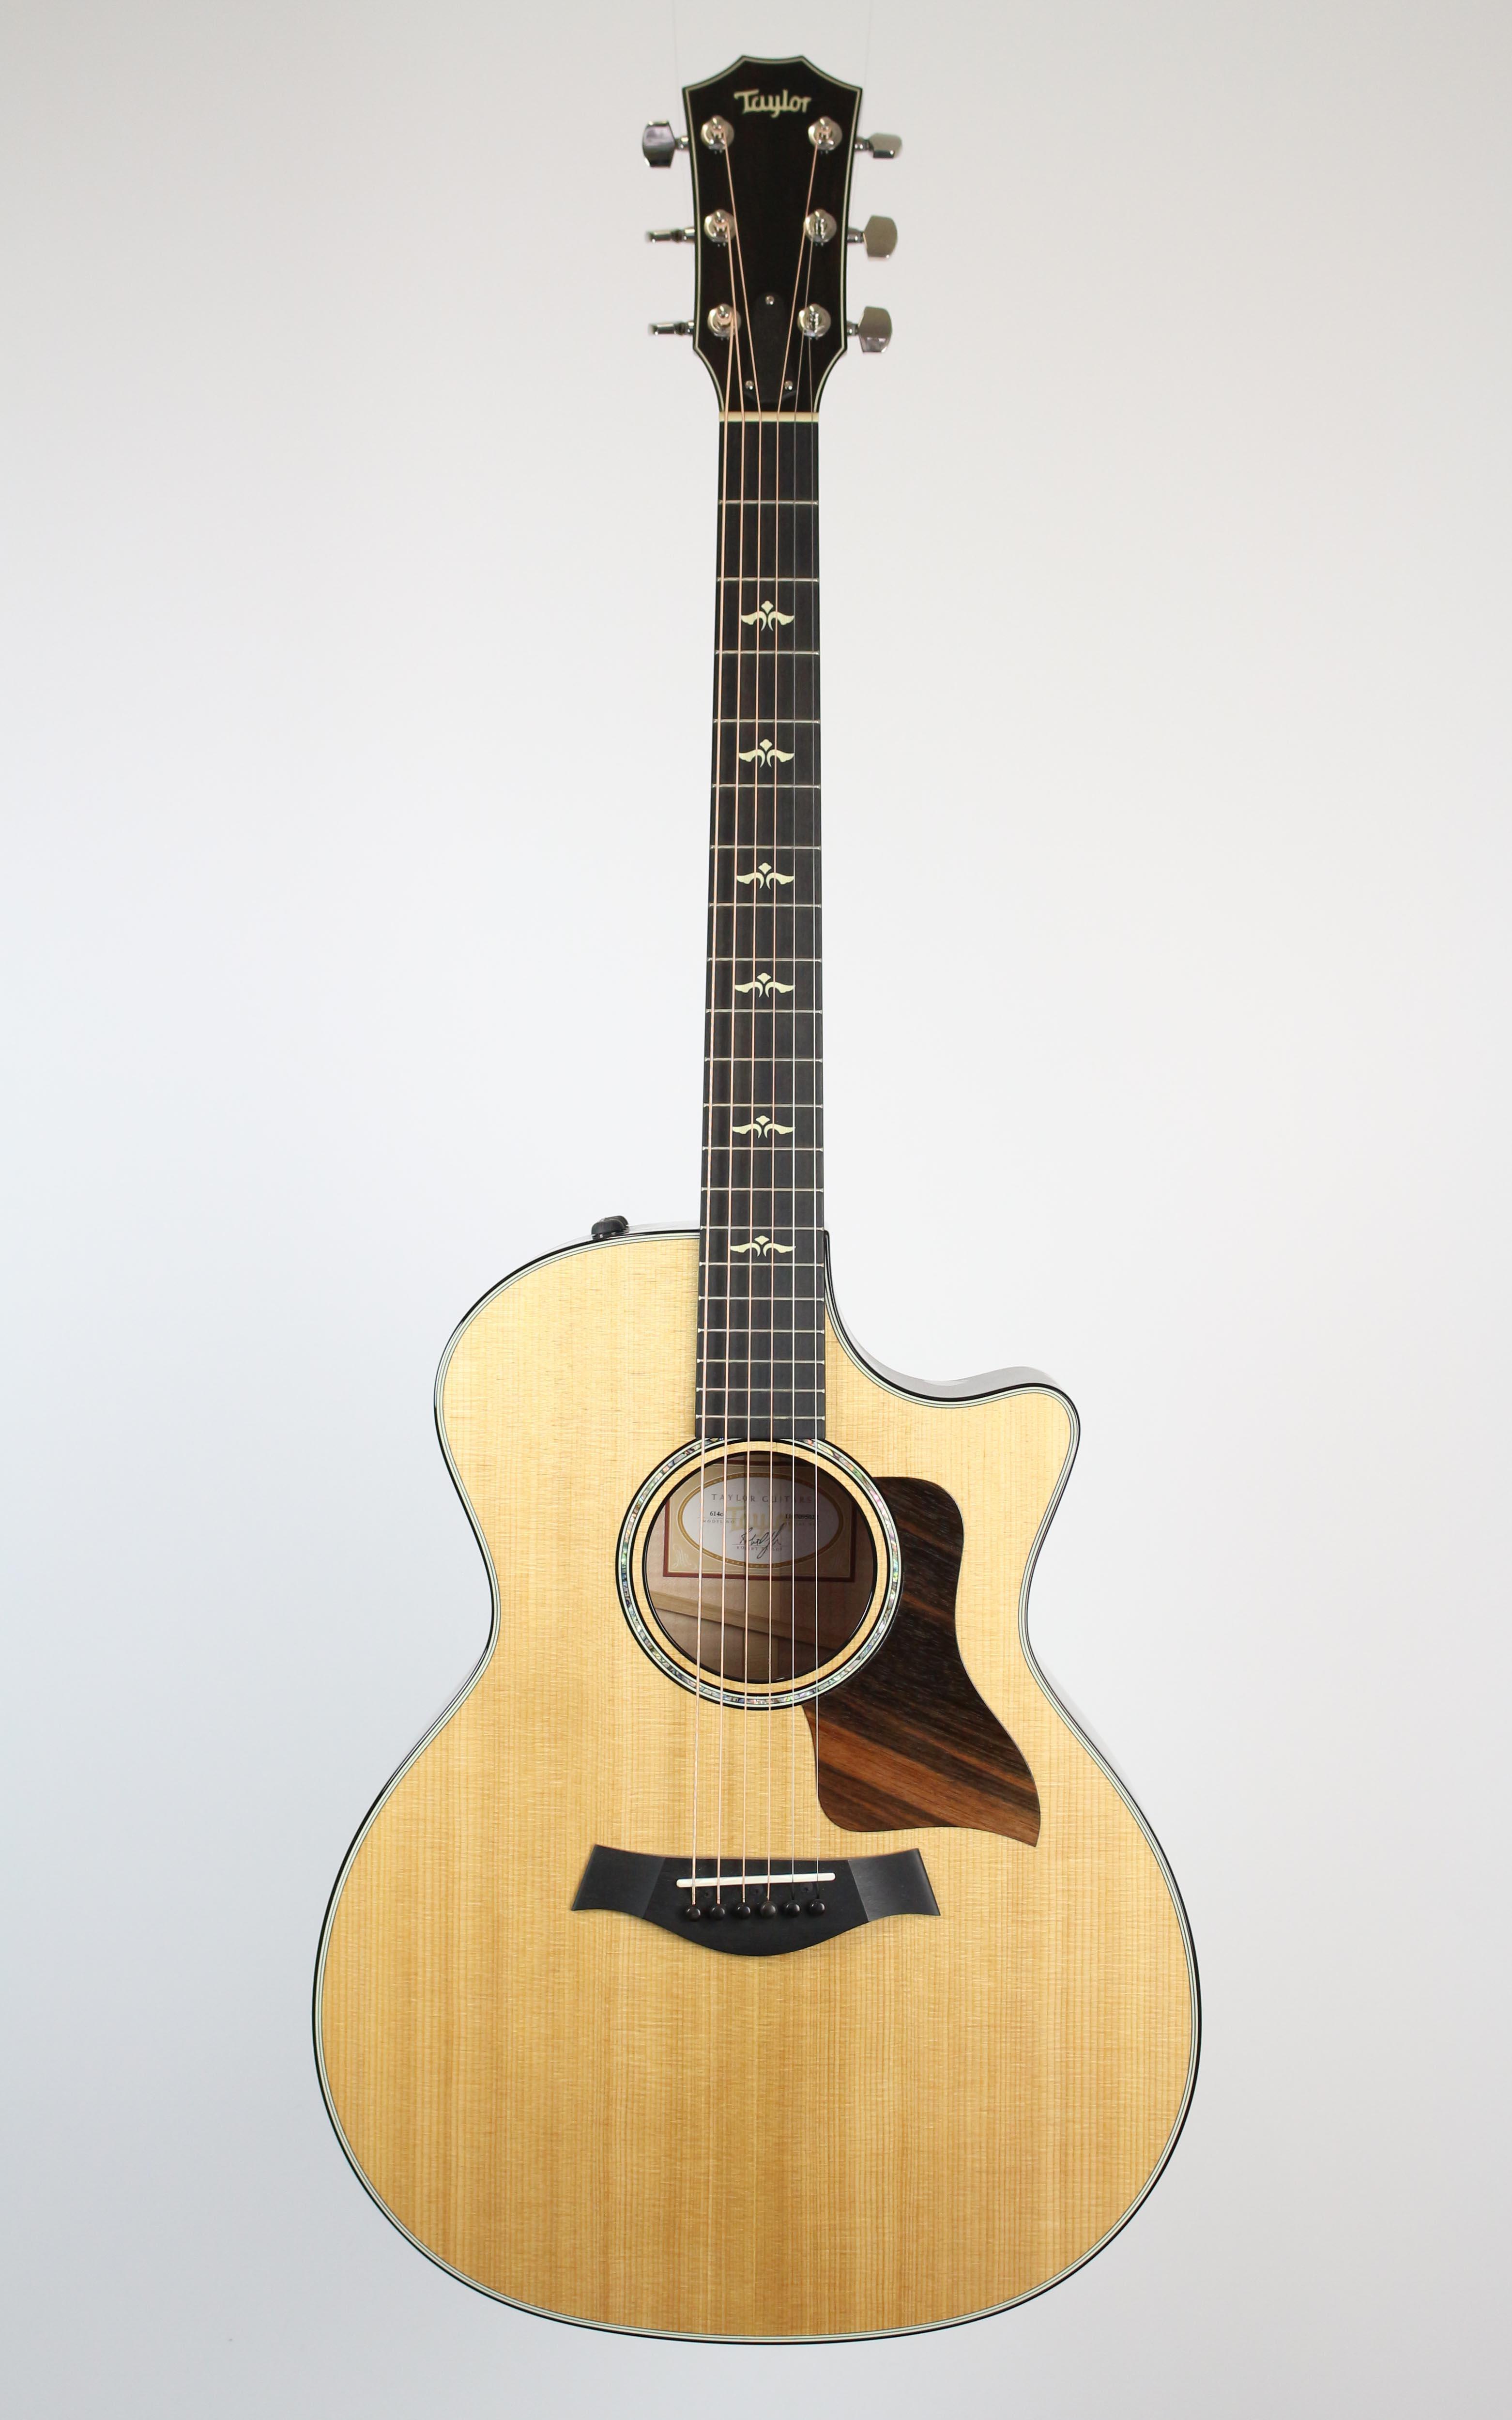 Taylor - 614ce - Gitarren - Westerngitarren | MUSIK BERTRAM Deutschland Freiburg